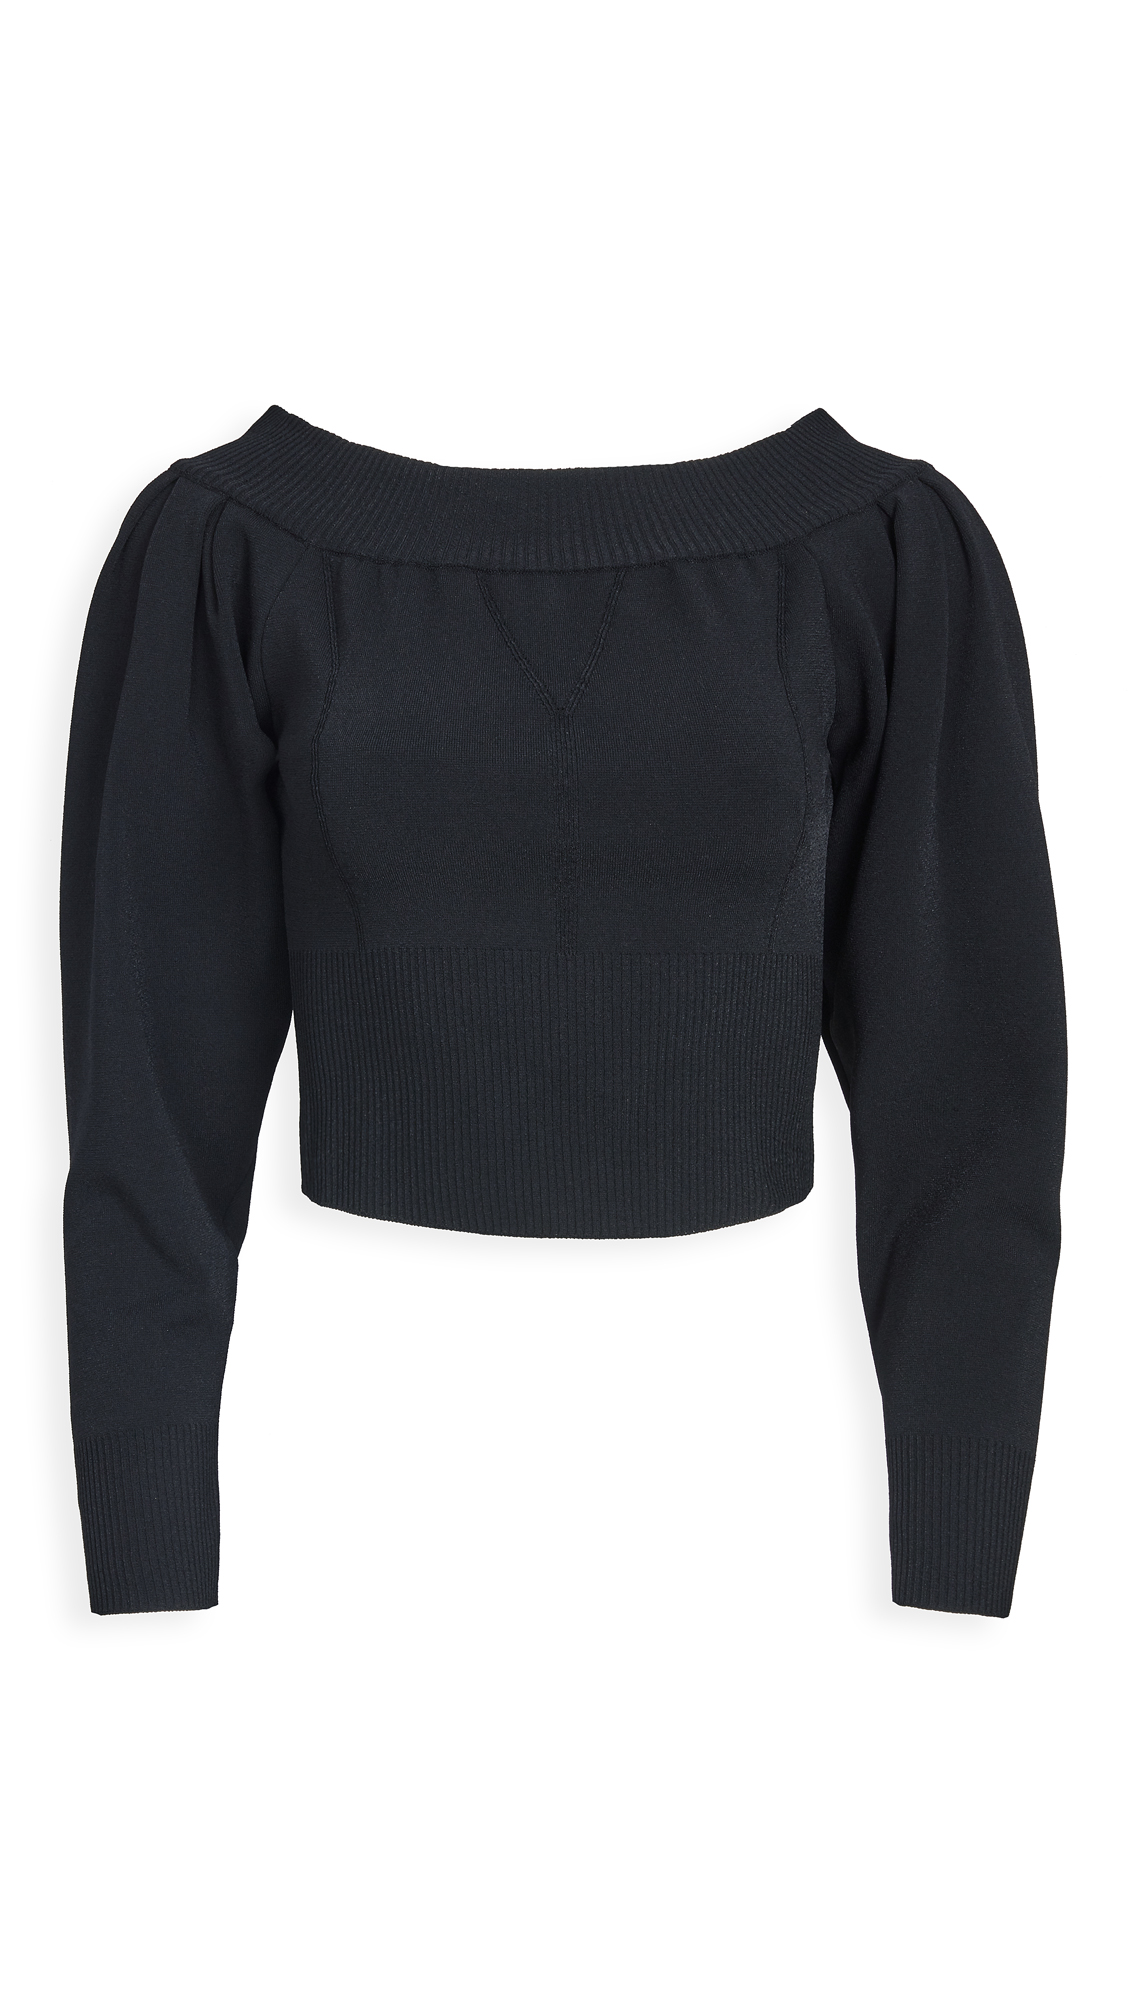 TRE by Natalie Ratabesi The Meteorite Sweater